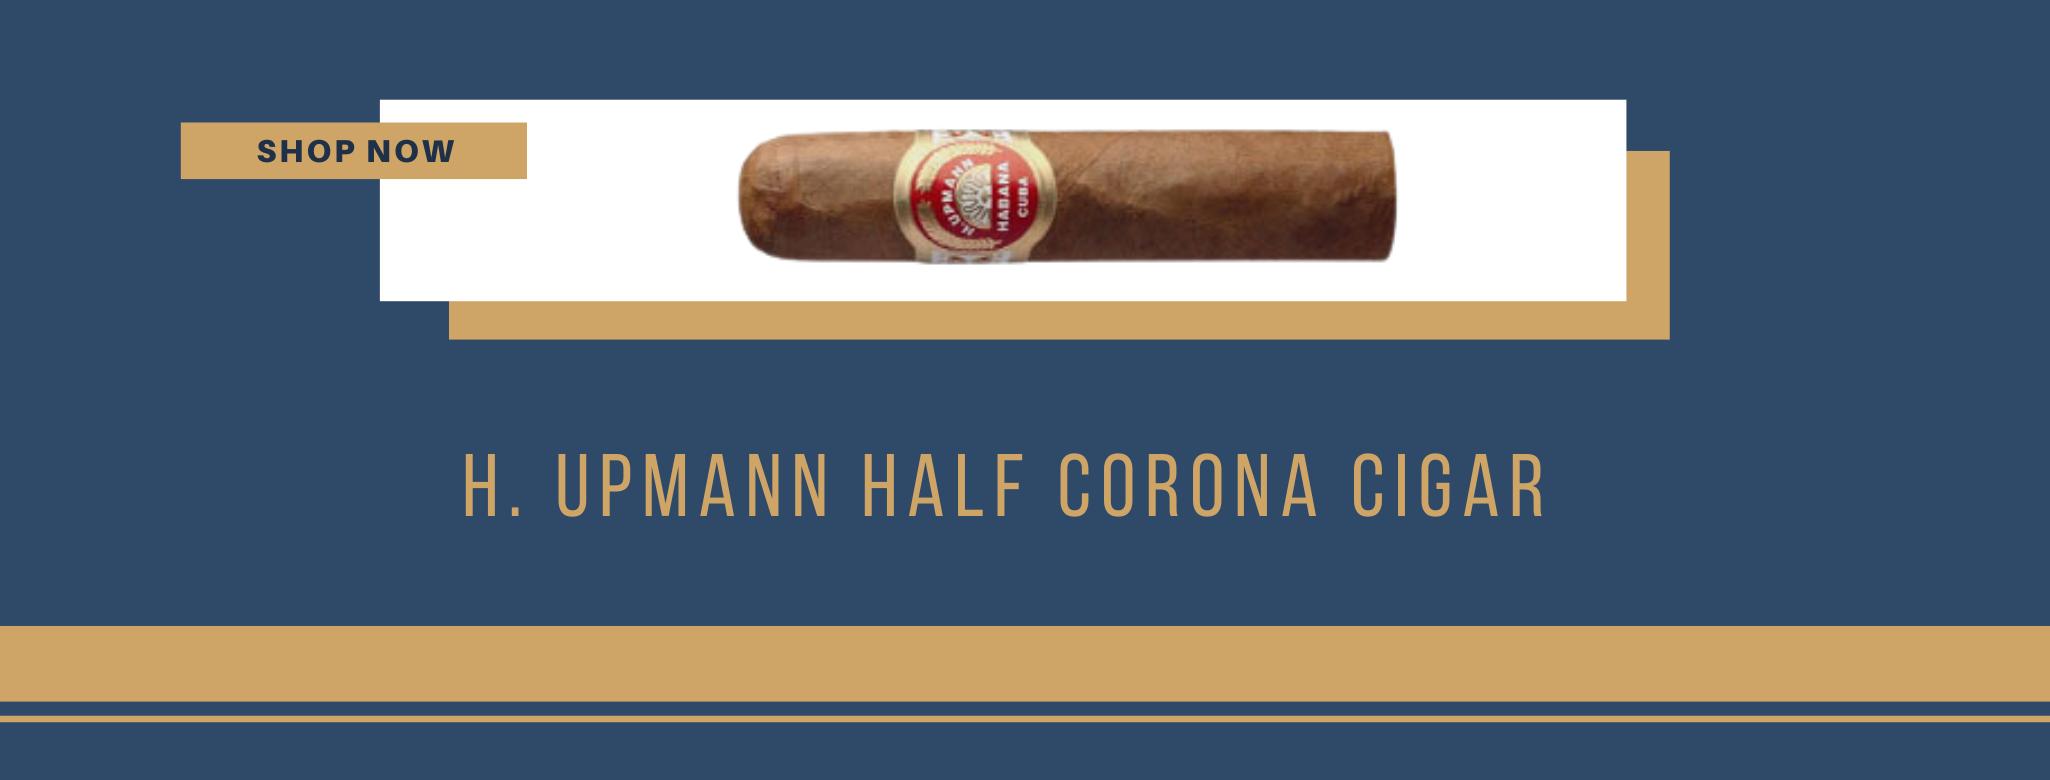 Buy H. Upmann Half Corona cigars online